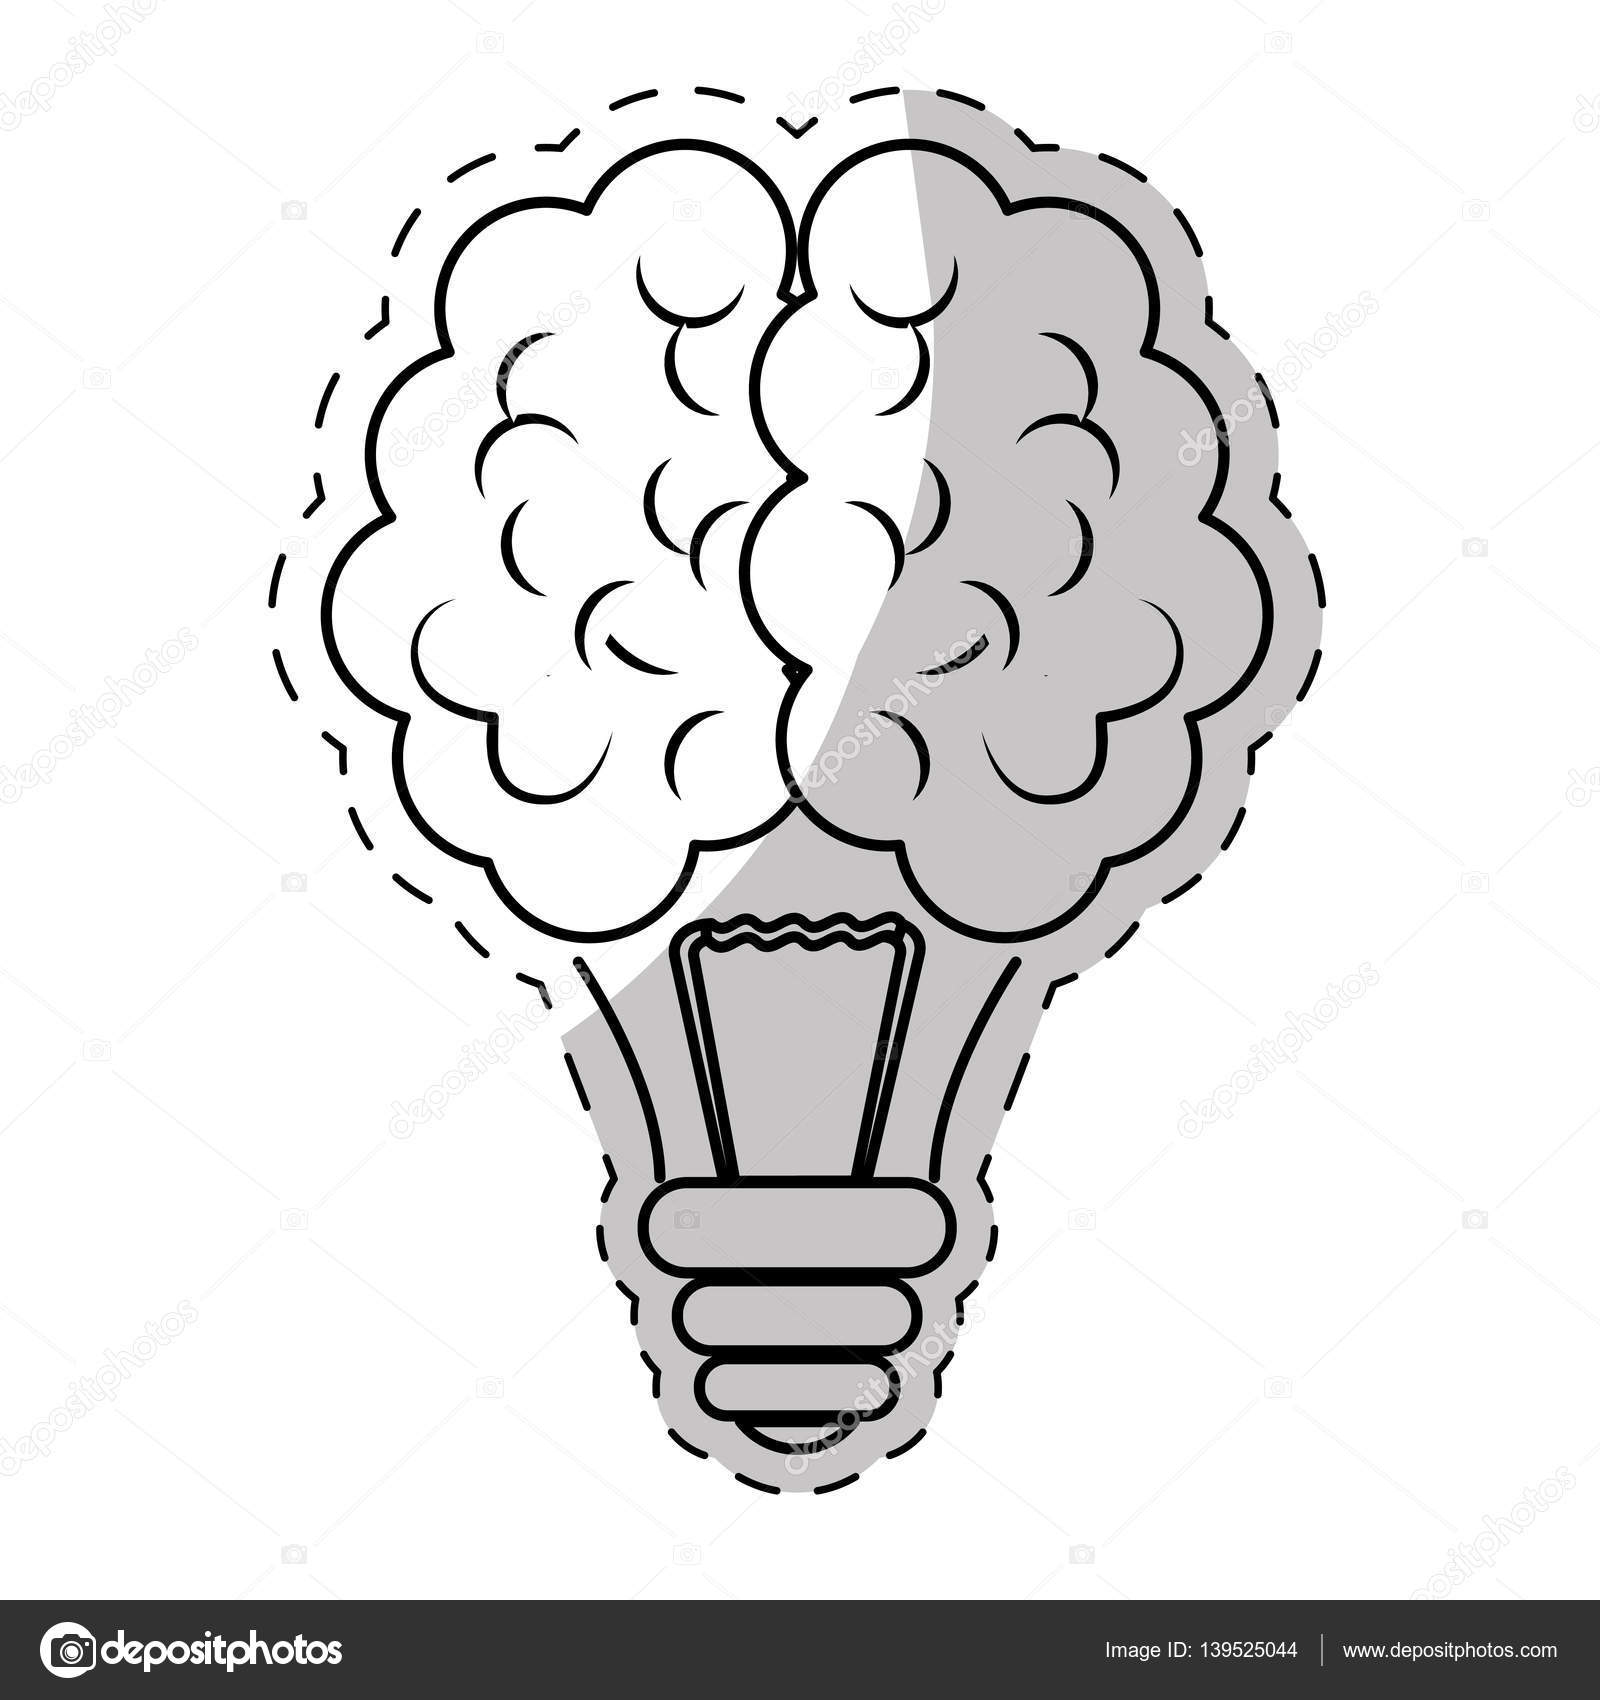 Brain And Lightbulb Bright Idea Icon Image Vector Illustration Design By Djv